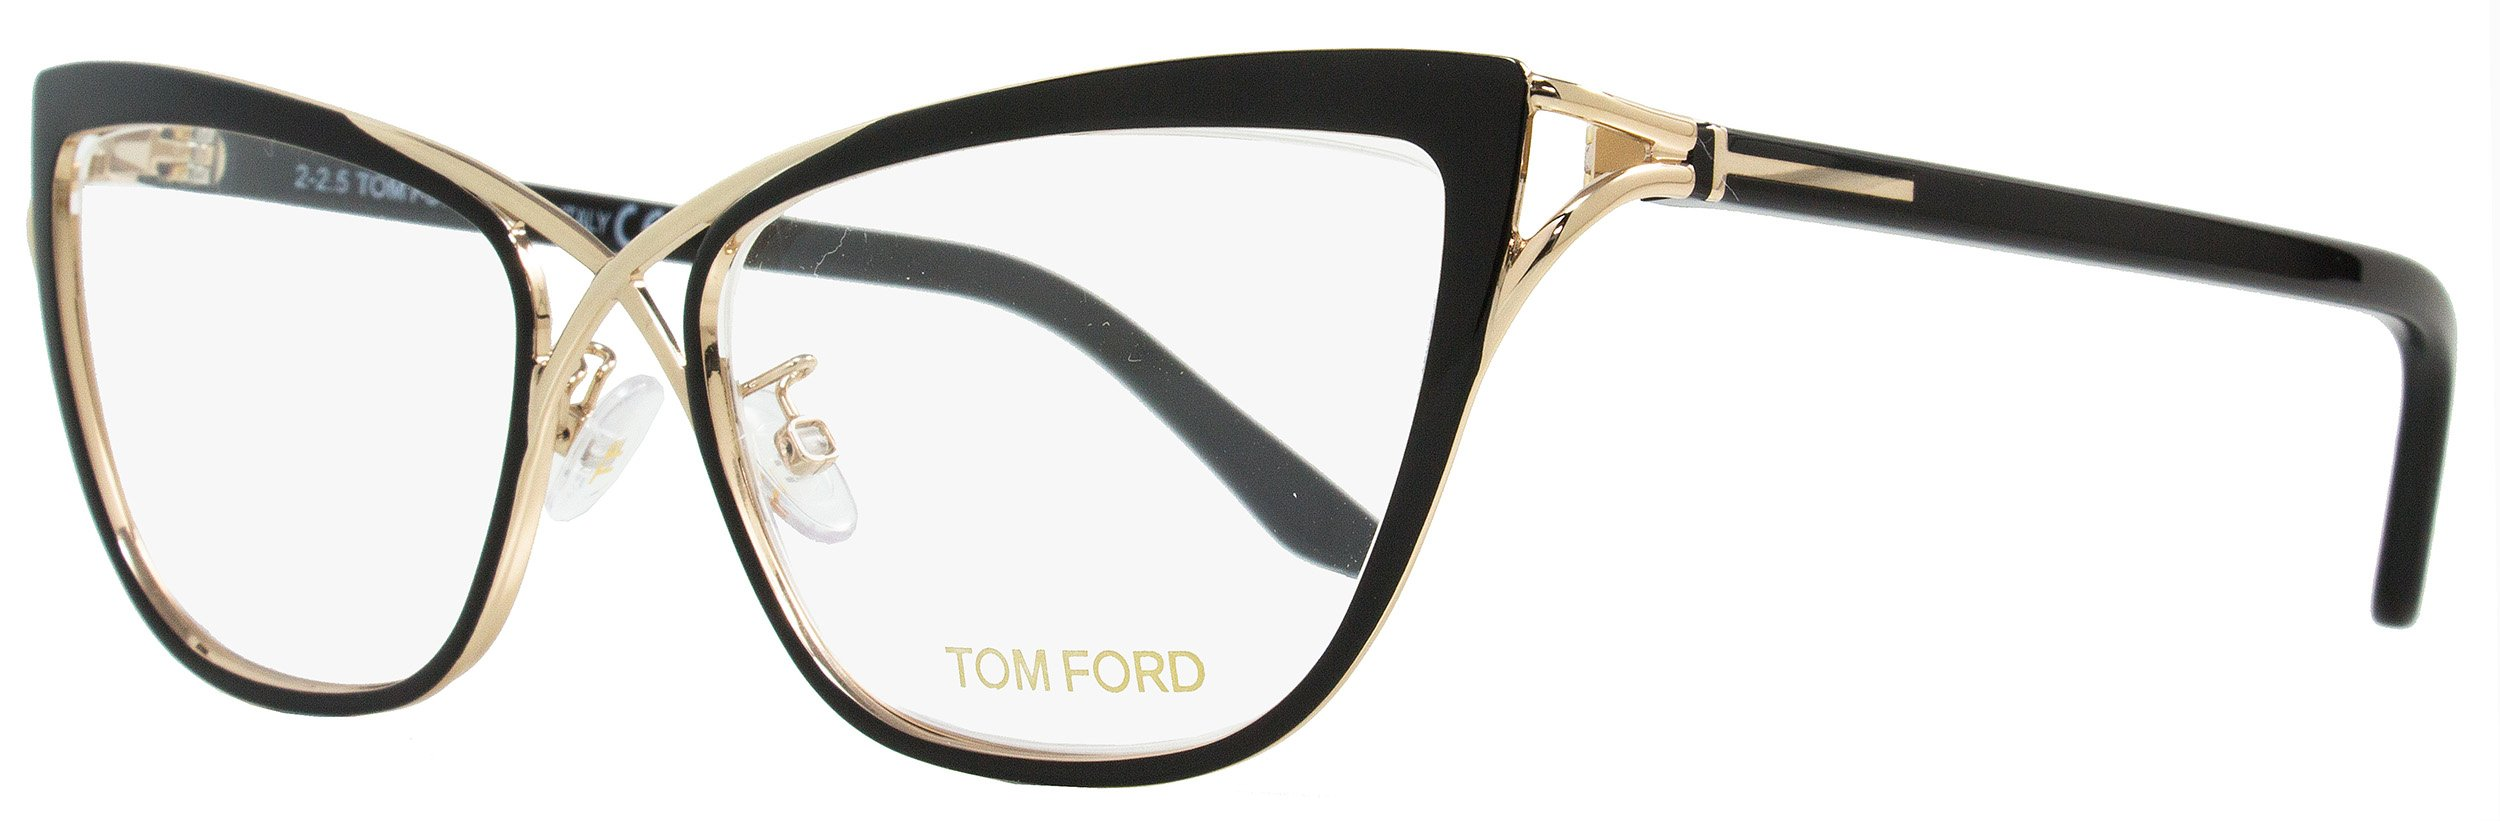 Tom Ford FT5272 Eyeglasses Color 005 by Tom Ford (Image #1)